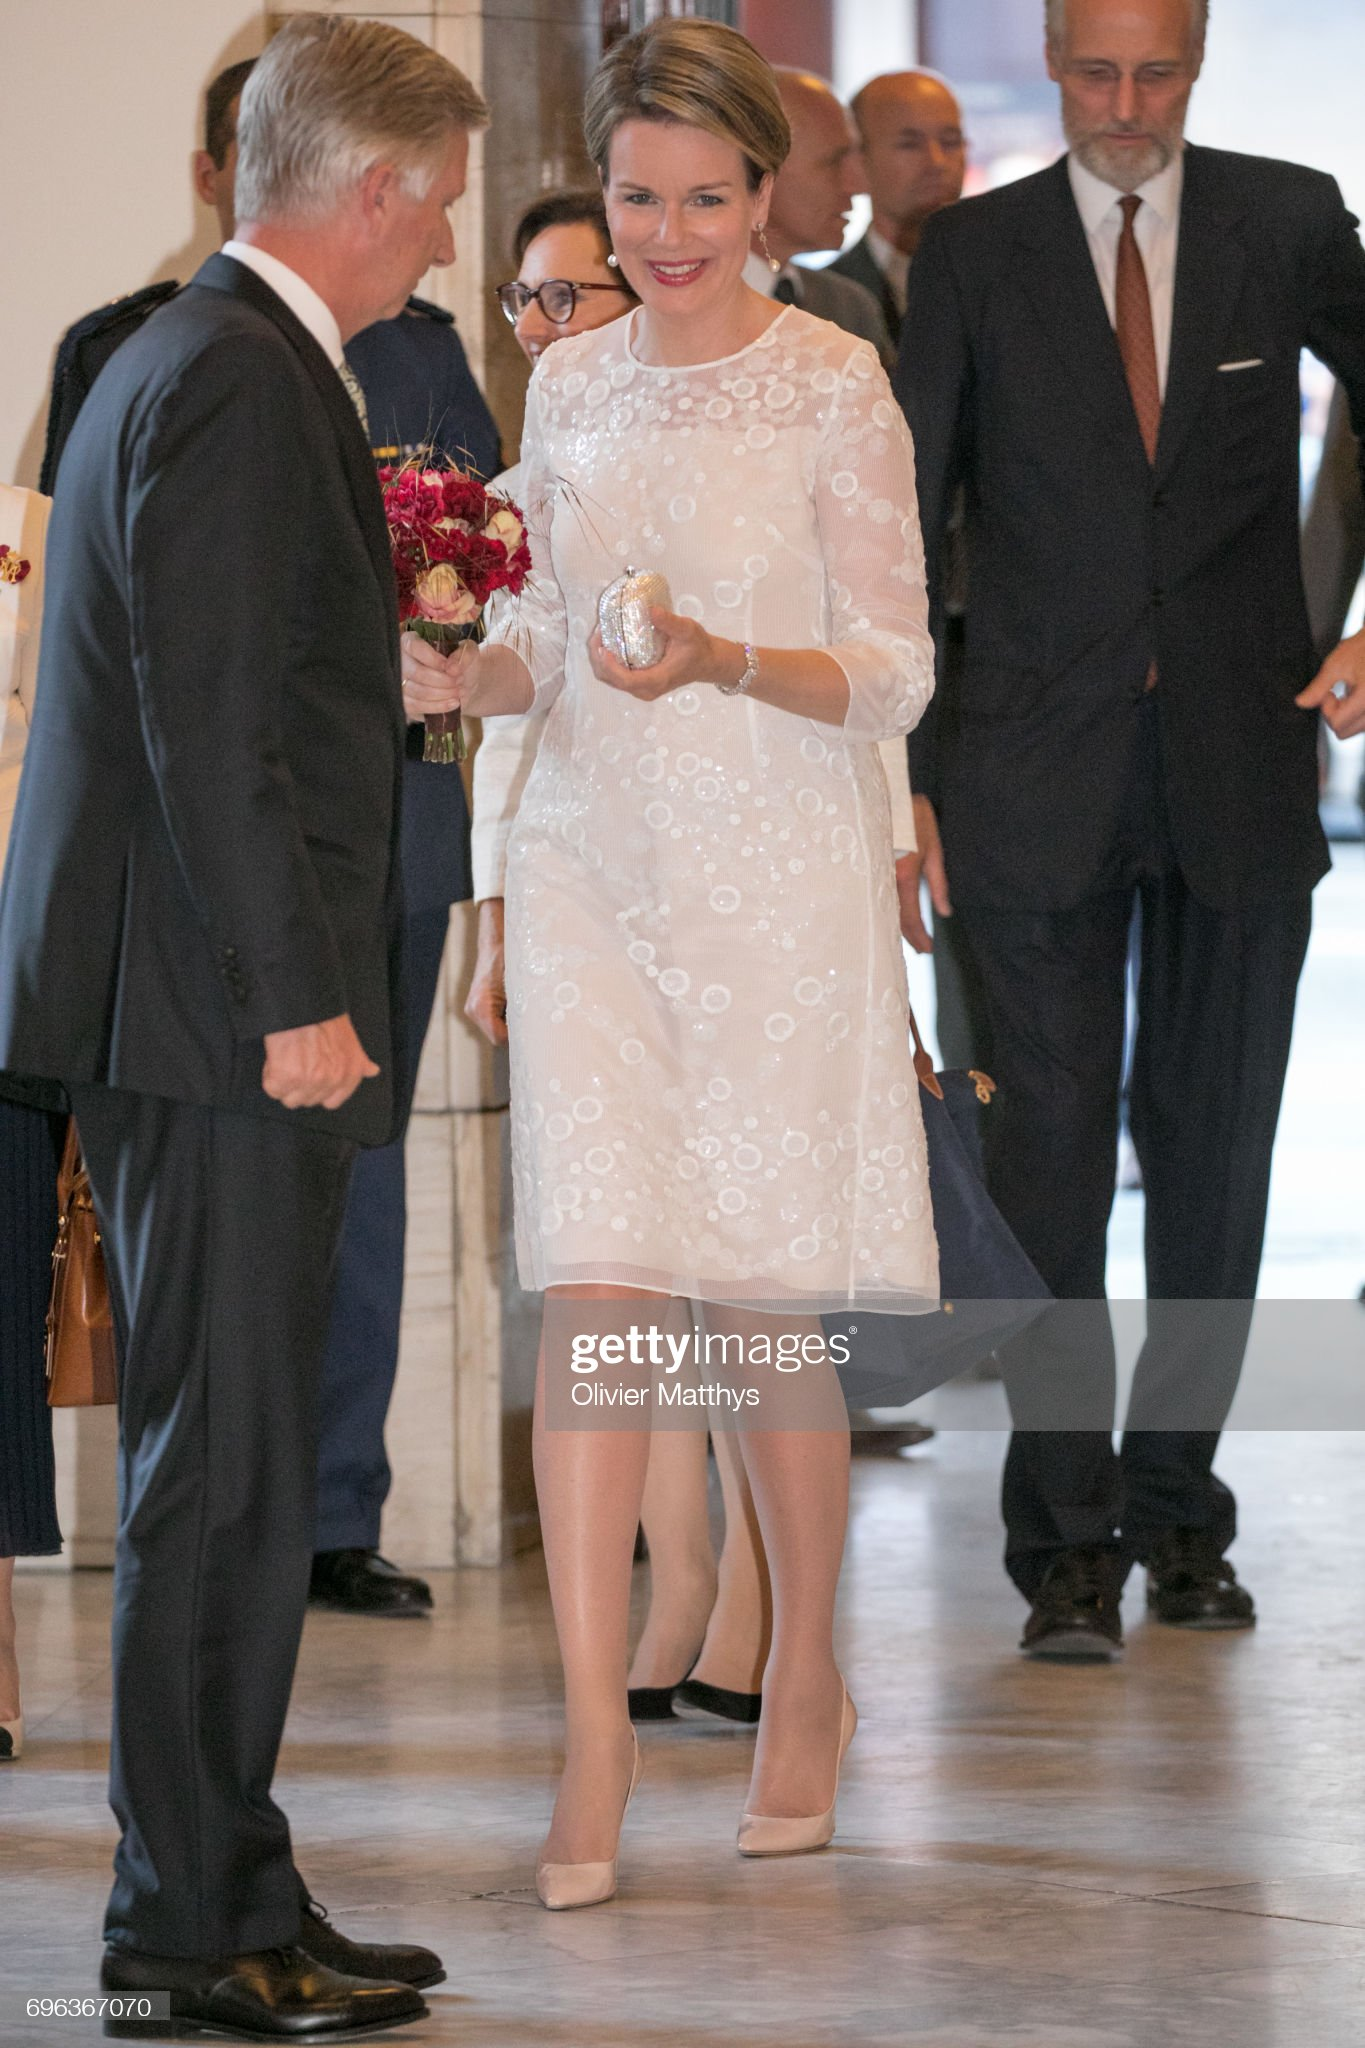 Вечерние наряды Королевы Матильды King Philippe Of Belgium And Queen Mathilde Of Belgium Attend A Concert At Palais Des Beaux Arts : News Photo